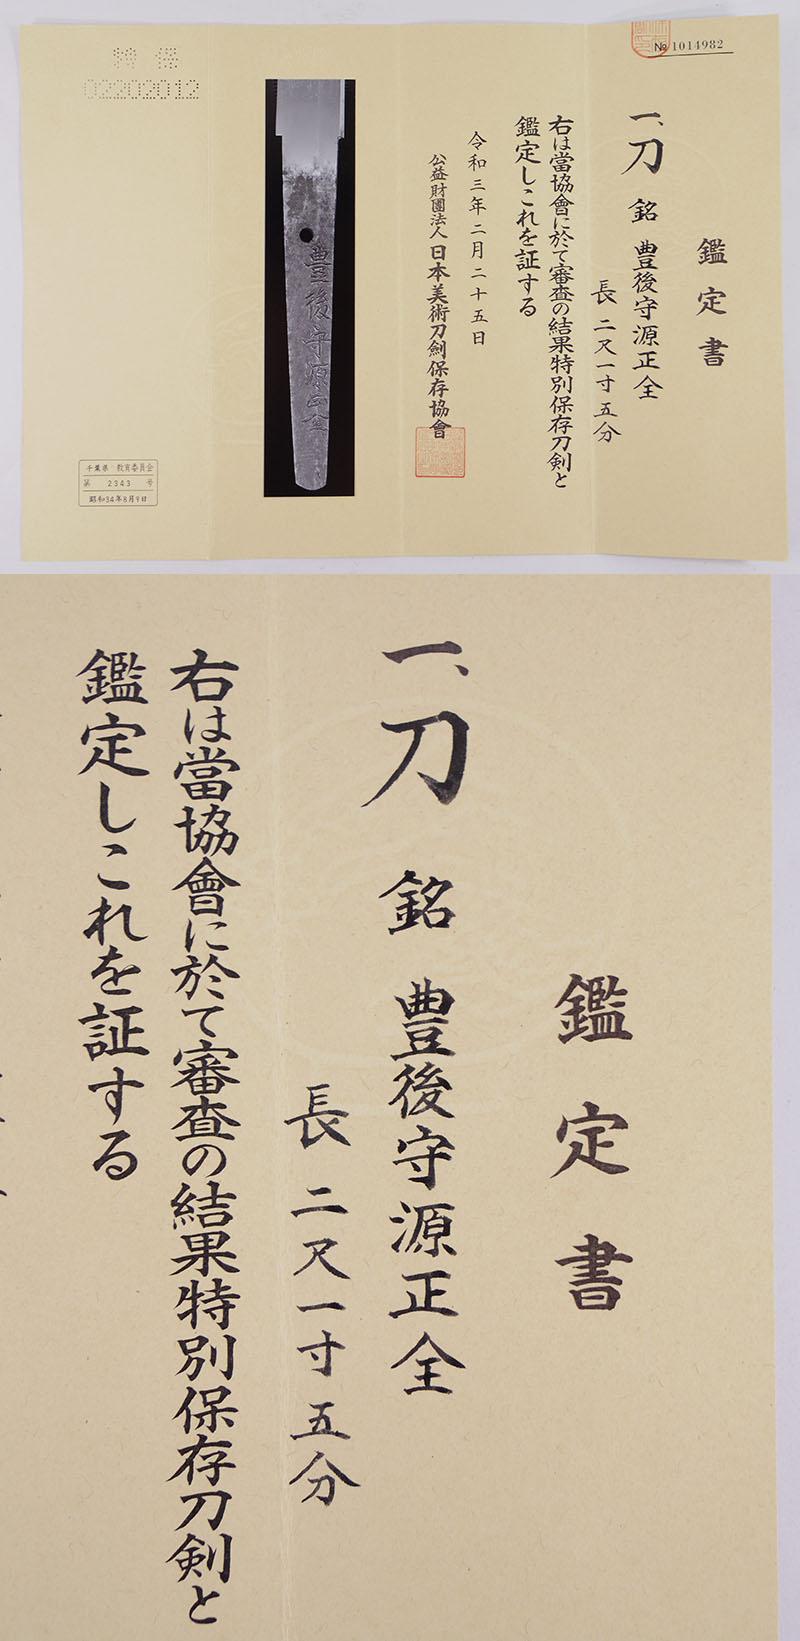 刀 豊後守源正全 (業物) Picture of Certificate